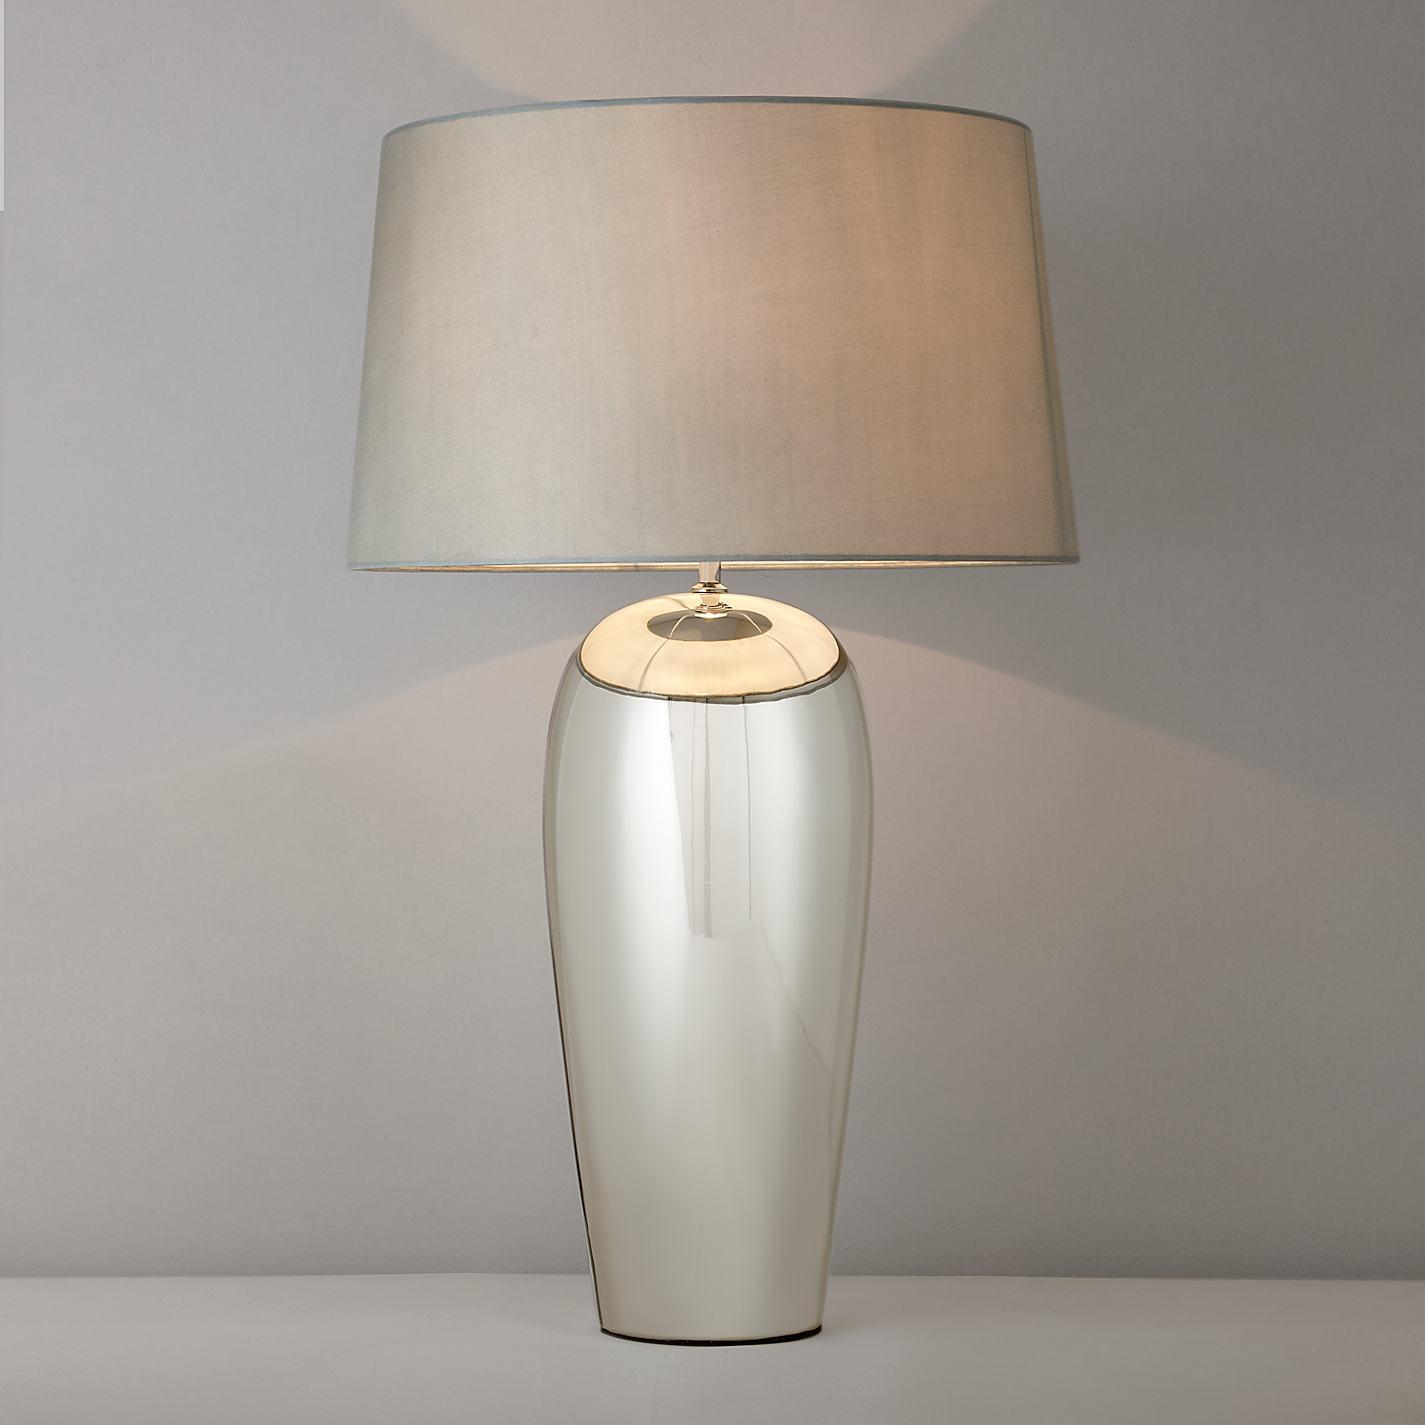 Buy john lewis zachery table lamp john lewis buy john lewis zachery table lamp online at johnlewis geotapseo Image collections